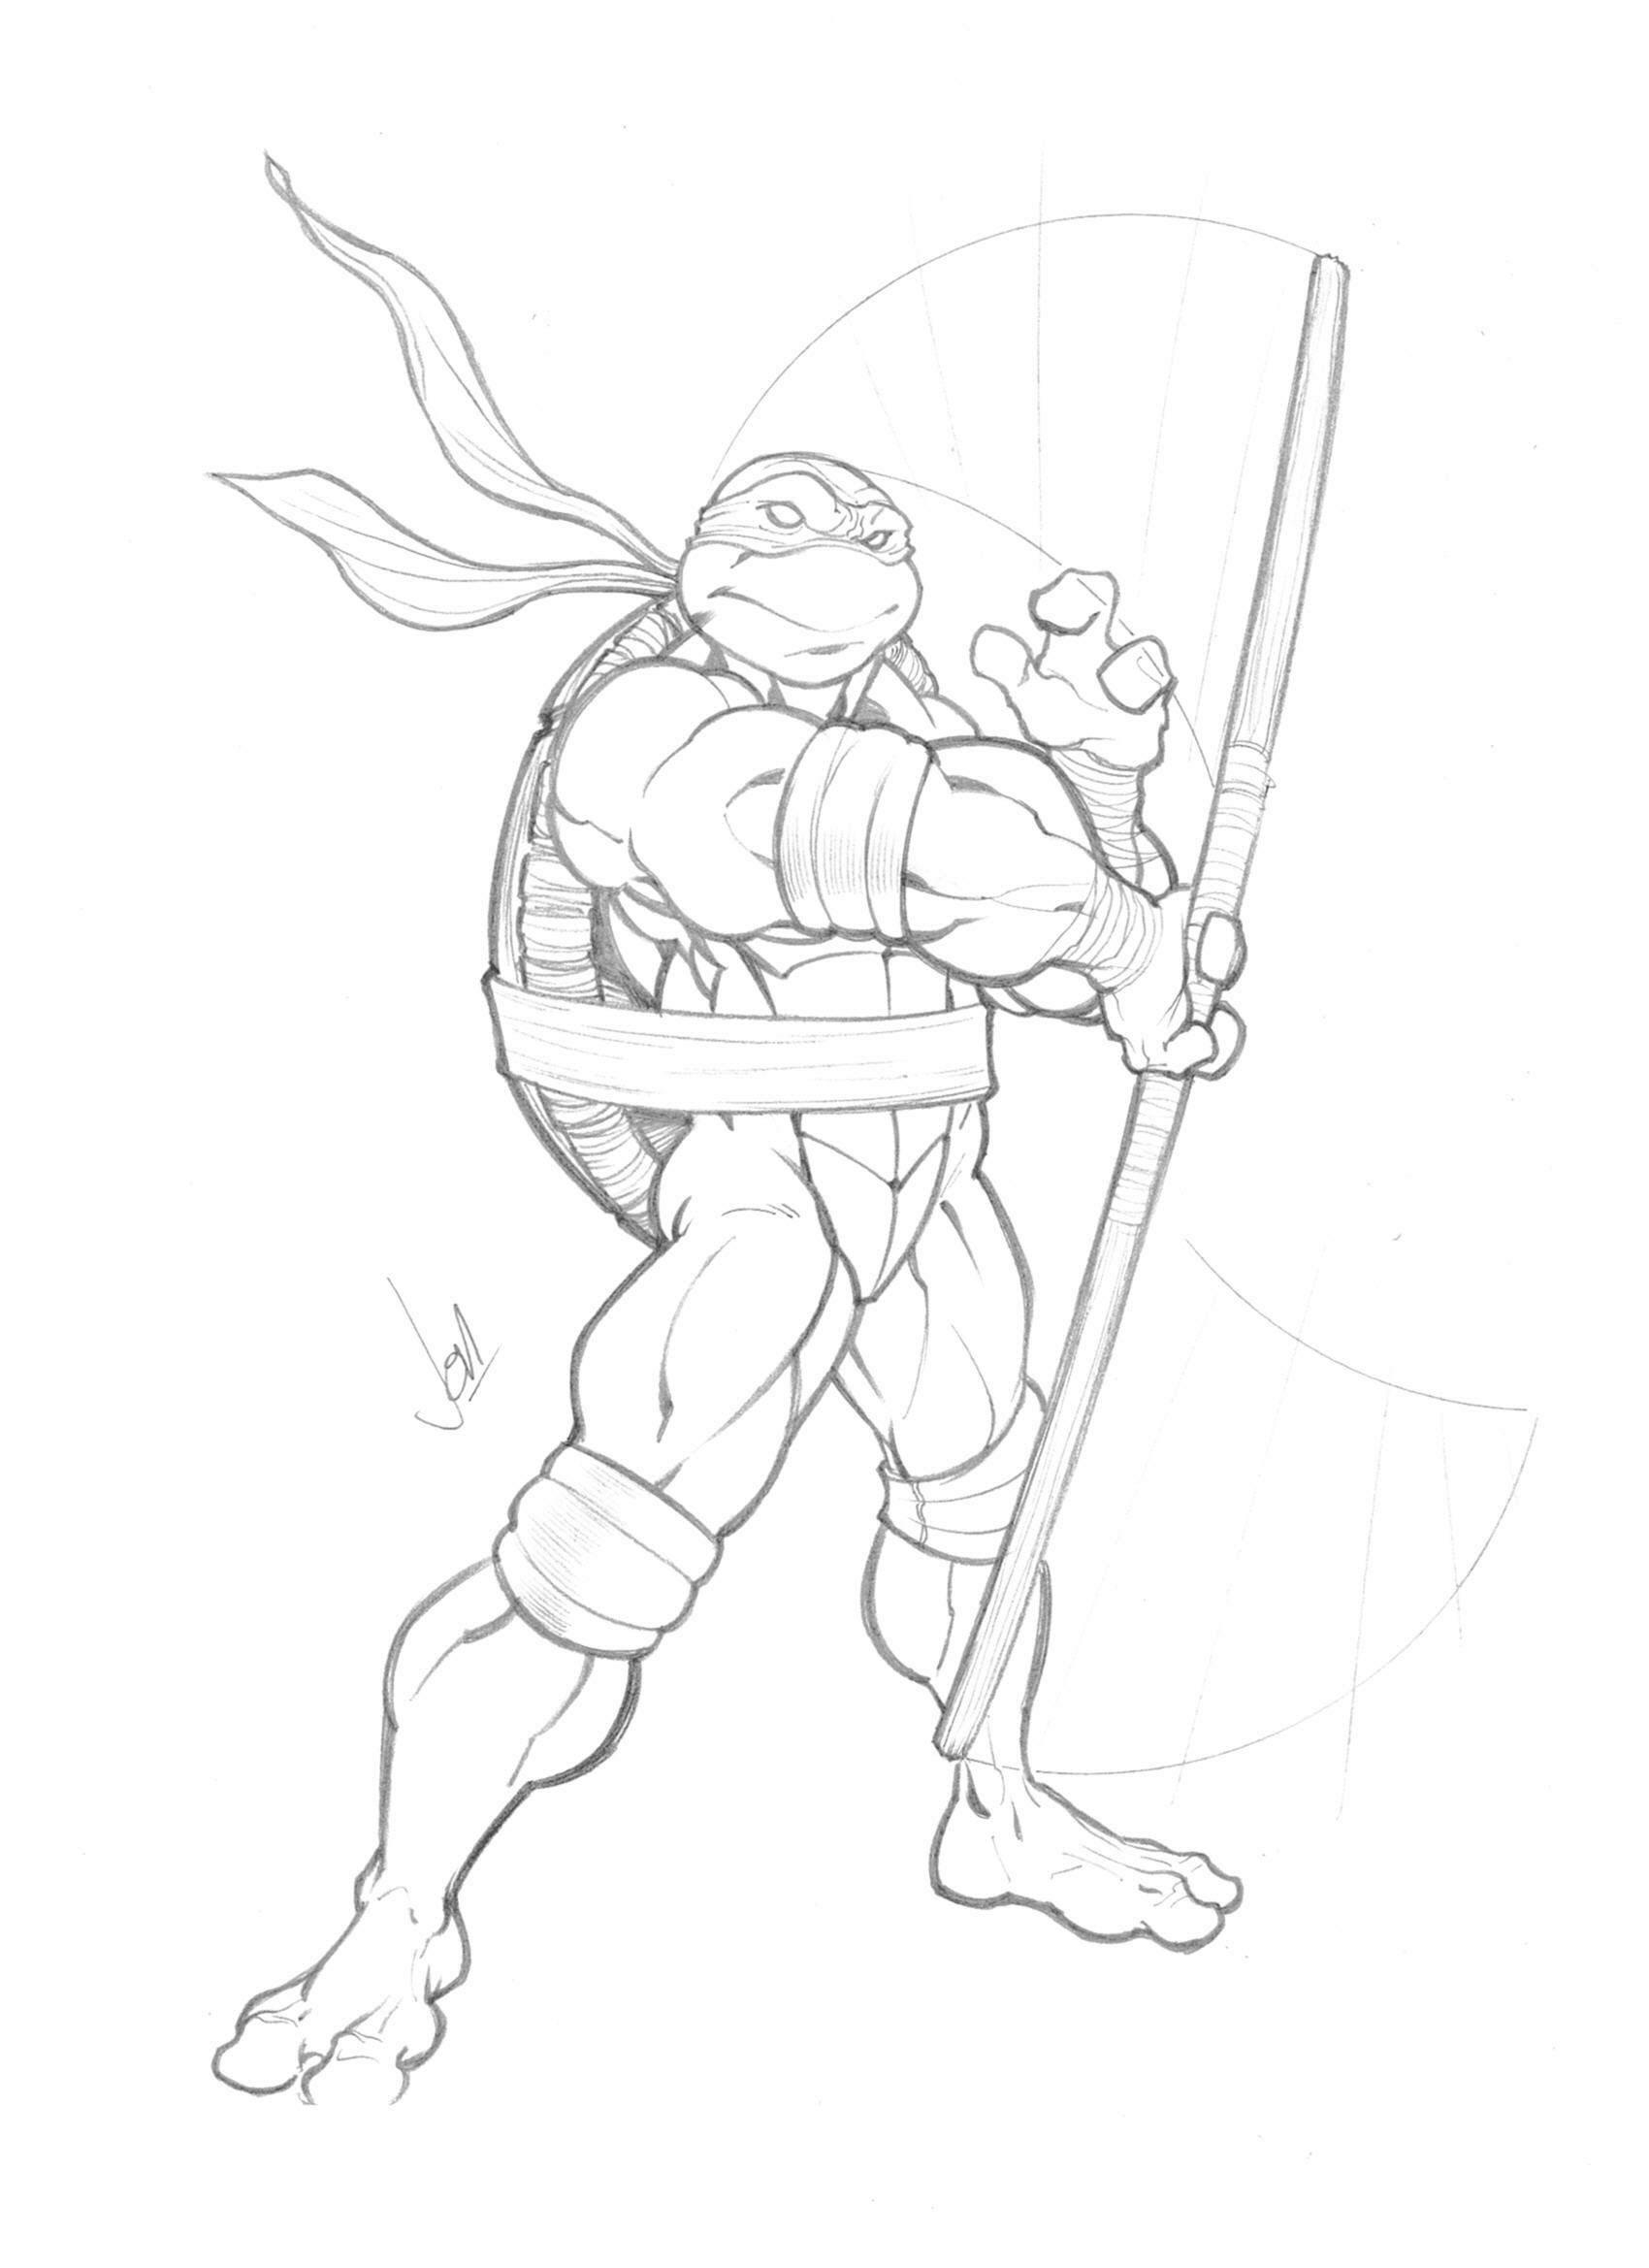 Line Art Ninja Turtles : Donatello by jpm on deviantart